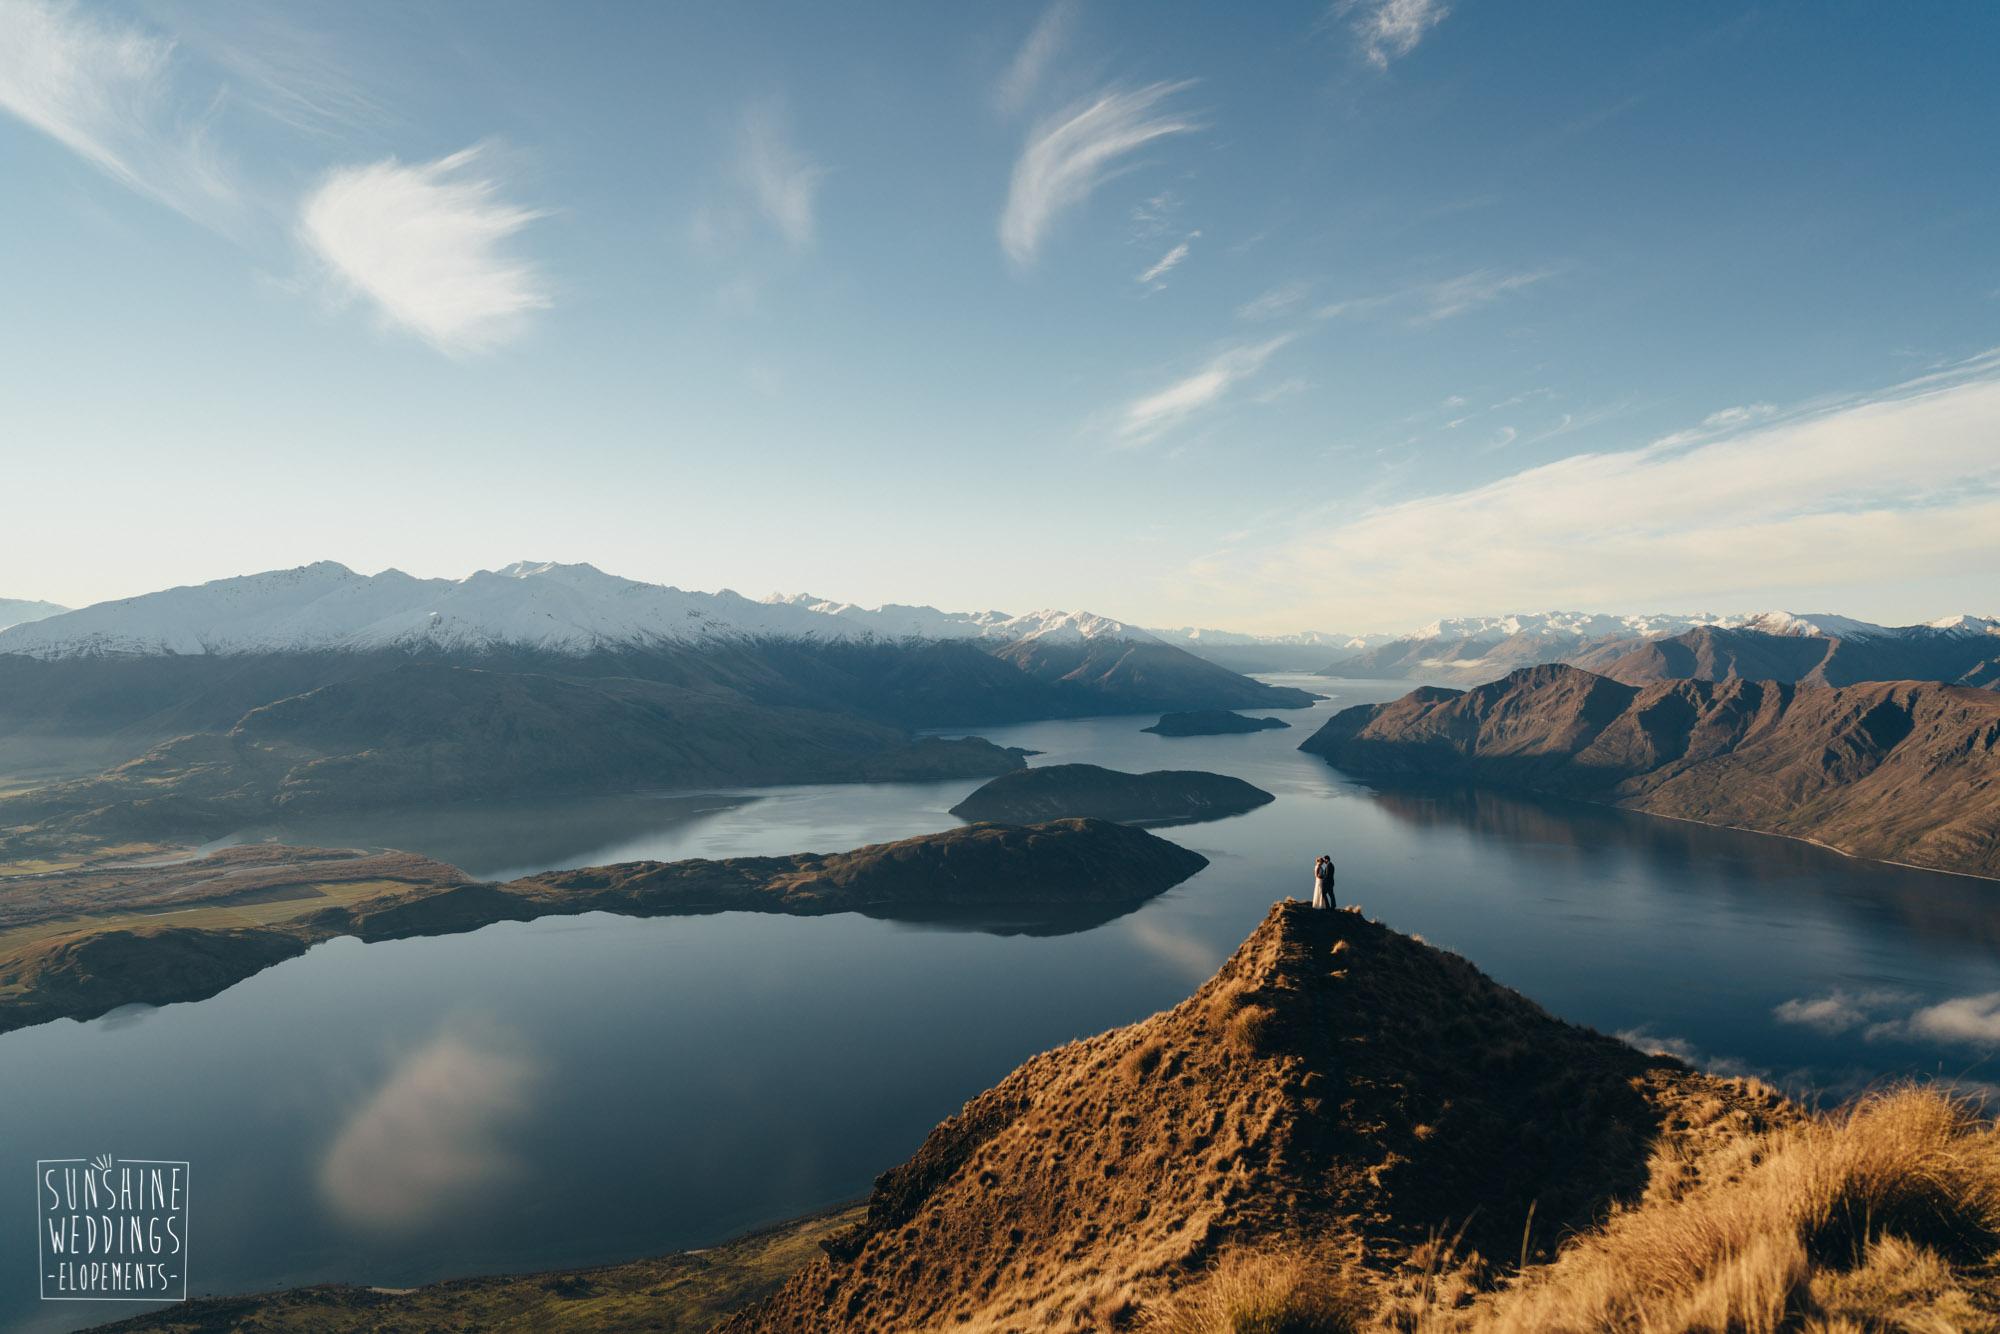 wedding Coromandel Peak, mounta roy views, spectacular NZ mountain wedding